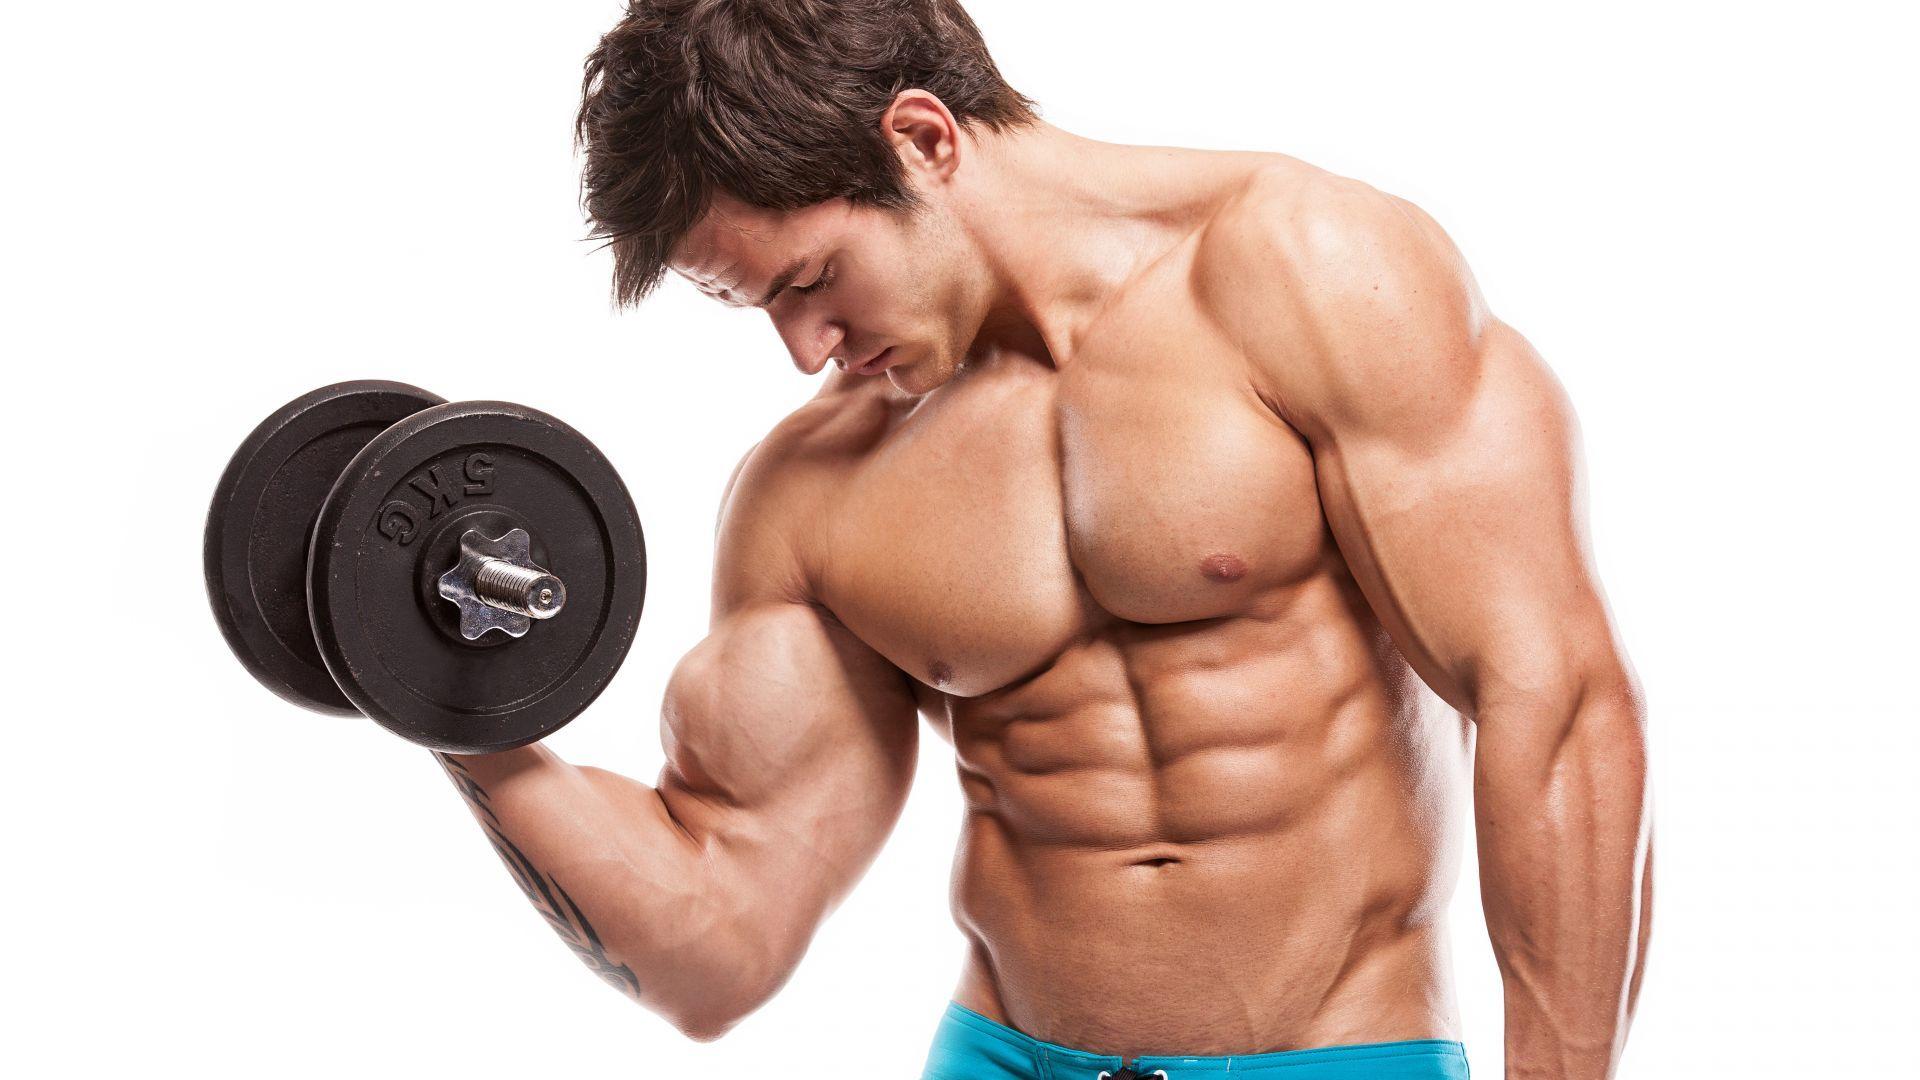 Спорт – для настоящих мужчин